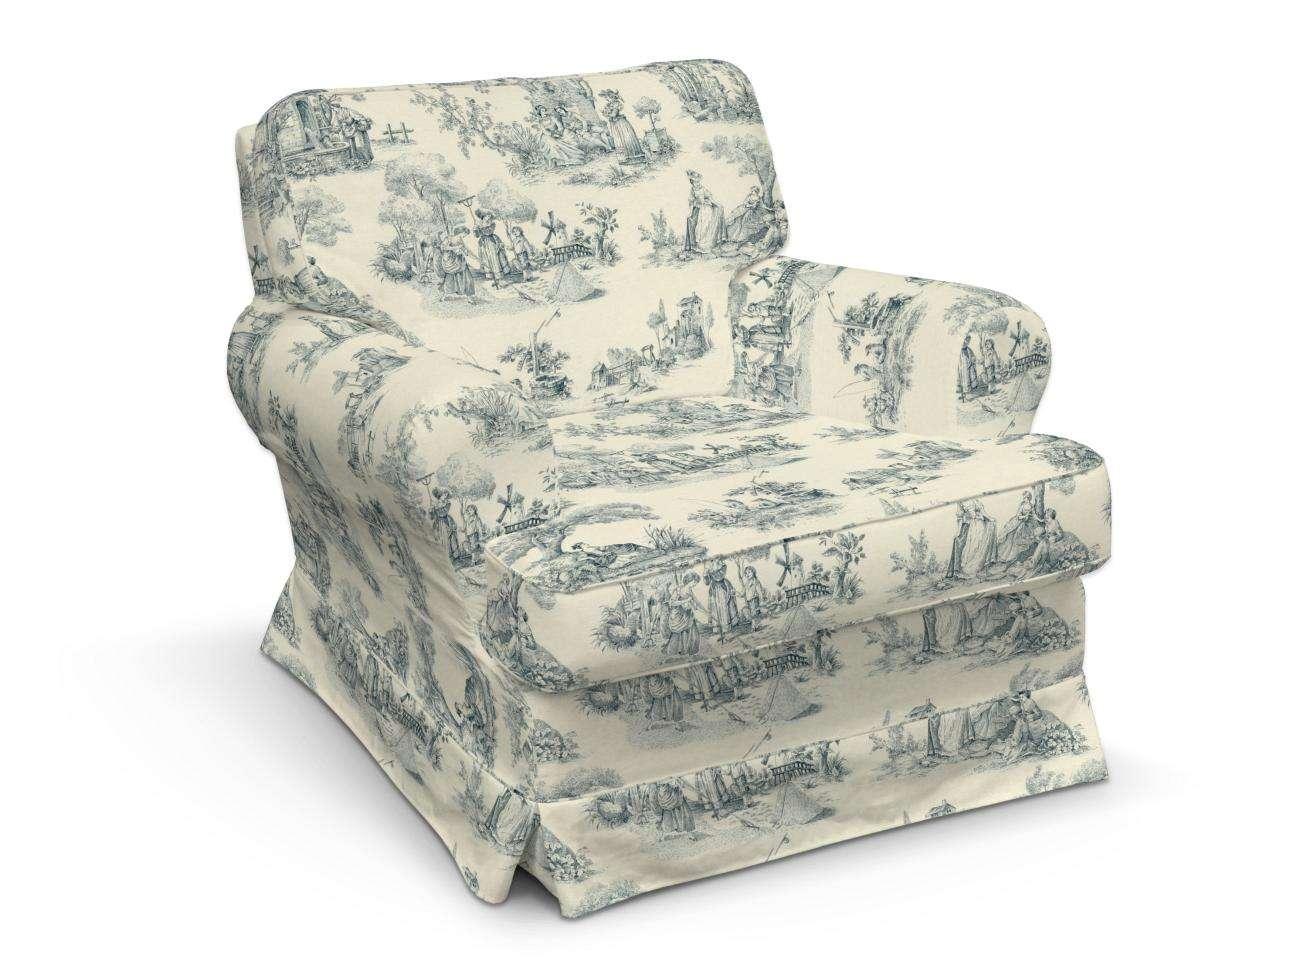 Barkaby Sesselbezug Sessel  Barkaby von der Kollektion Avinon, Stoff: 132-66